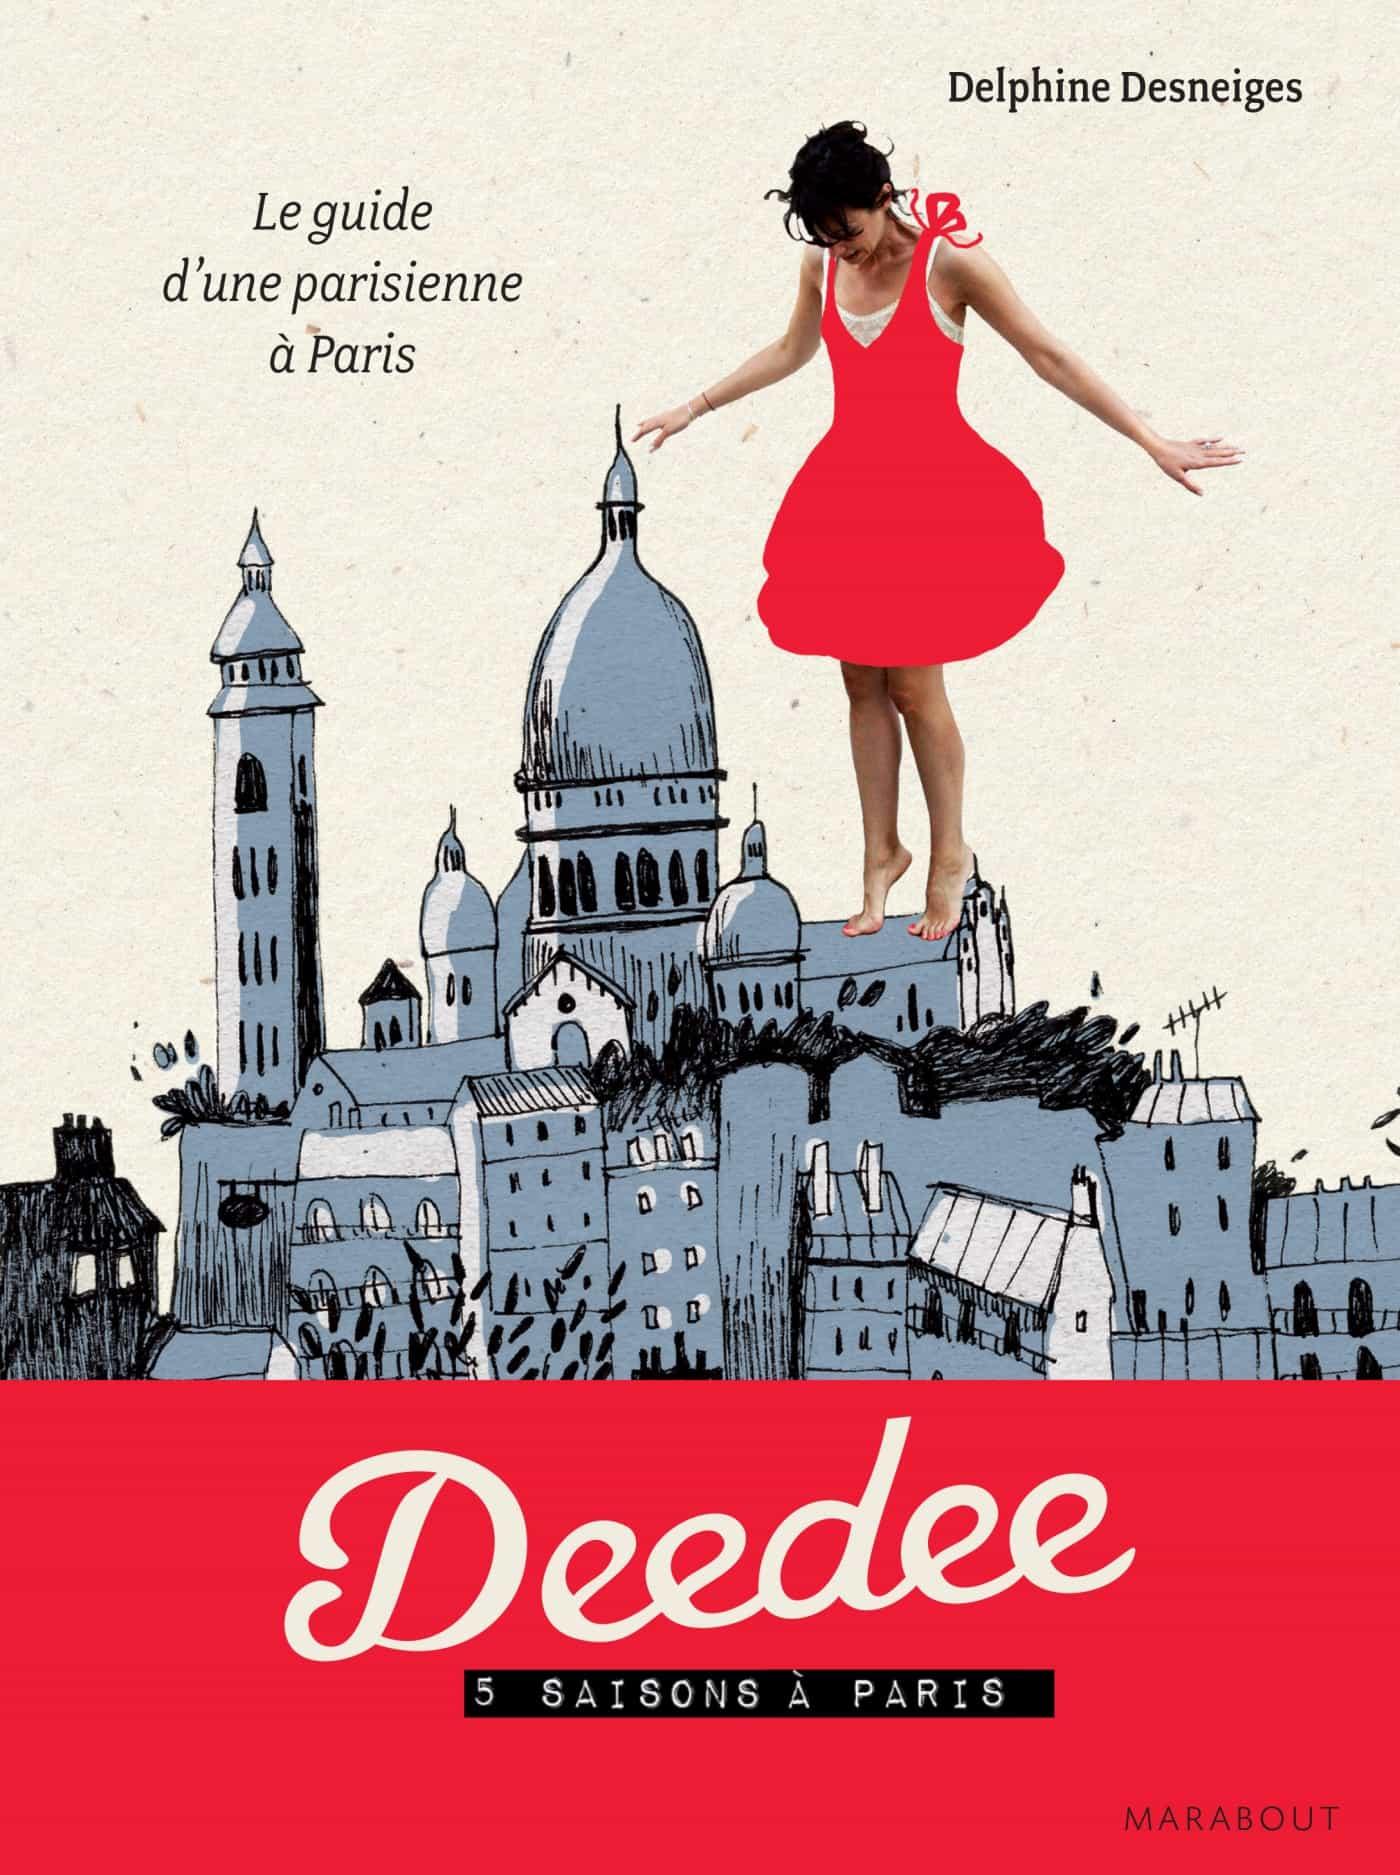 5-saisons-a-Paris-deedee